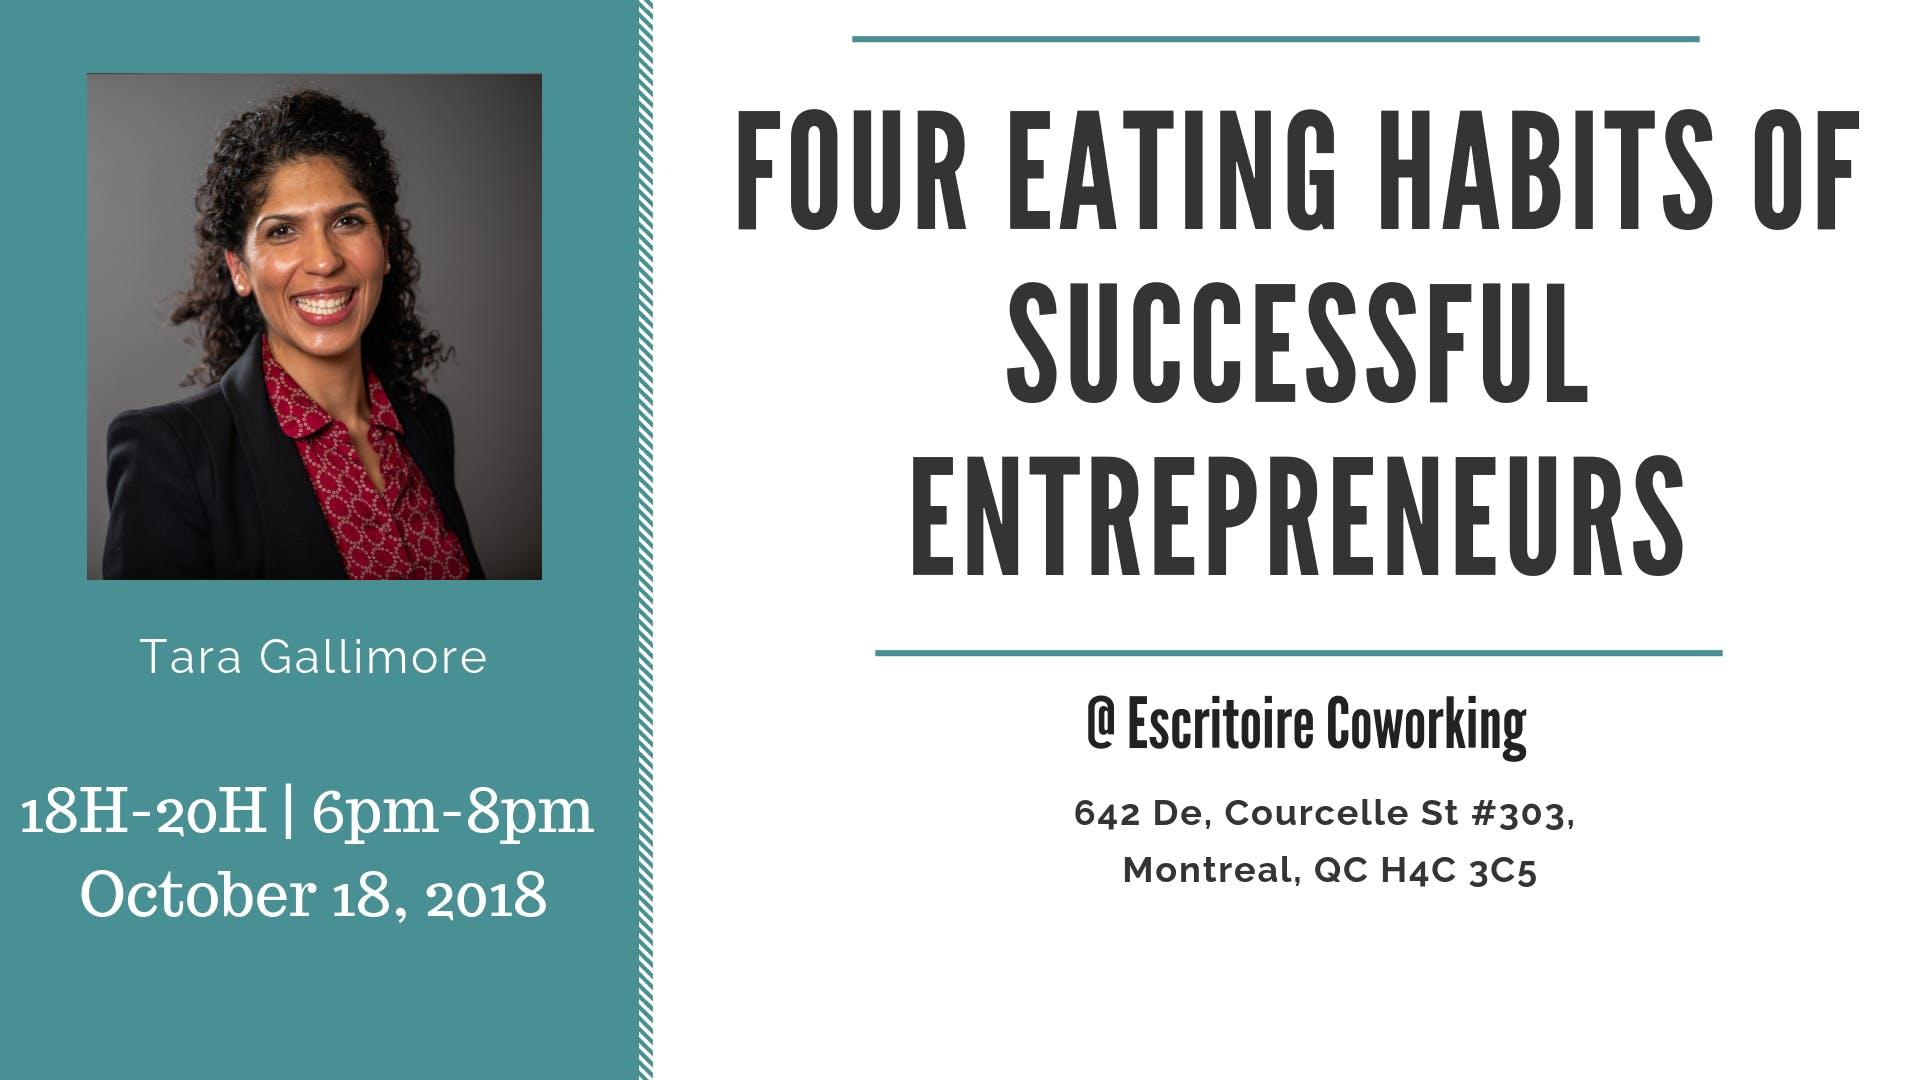 Four Eating Habits of Successful Entrepreneur